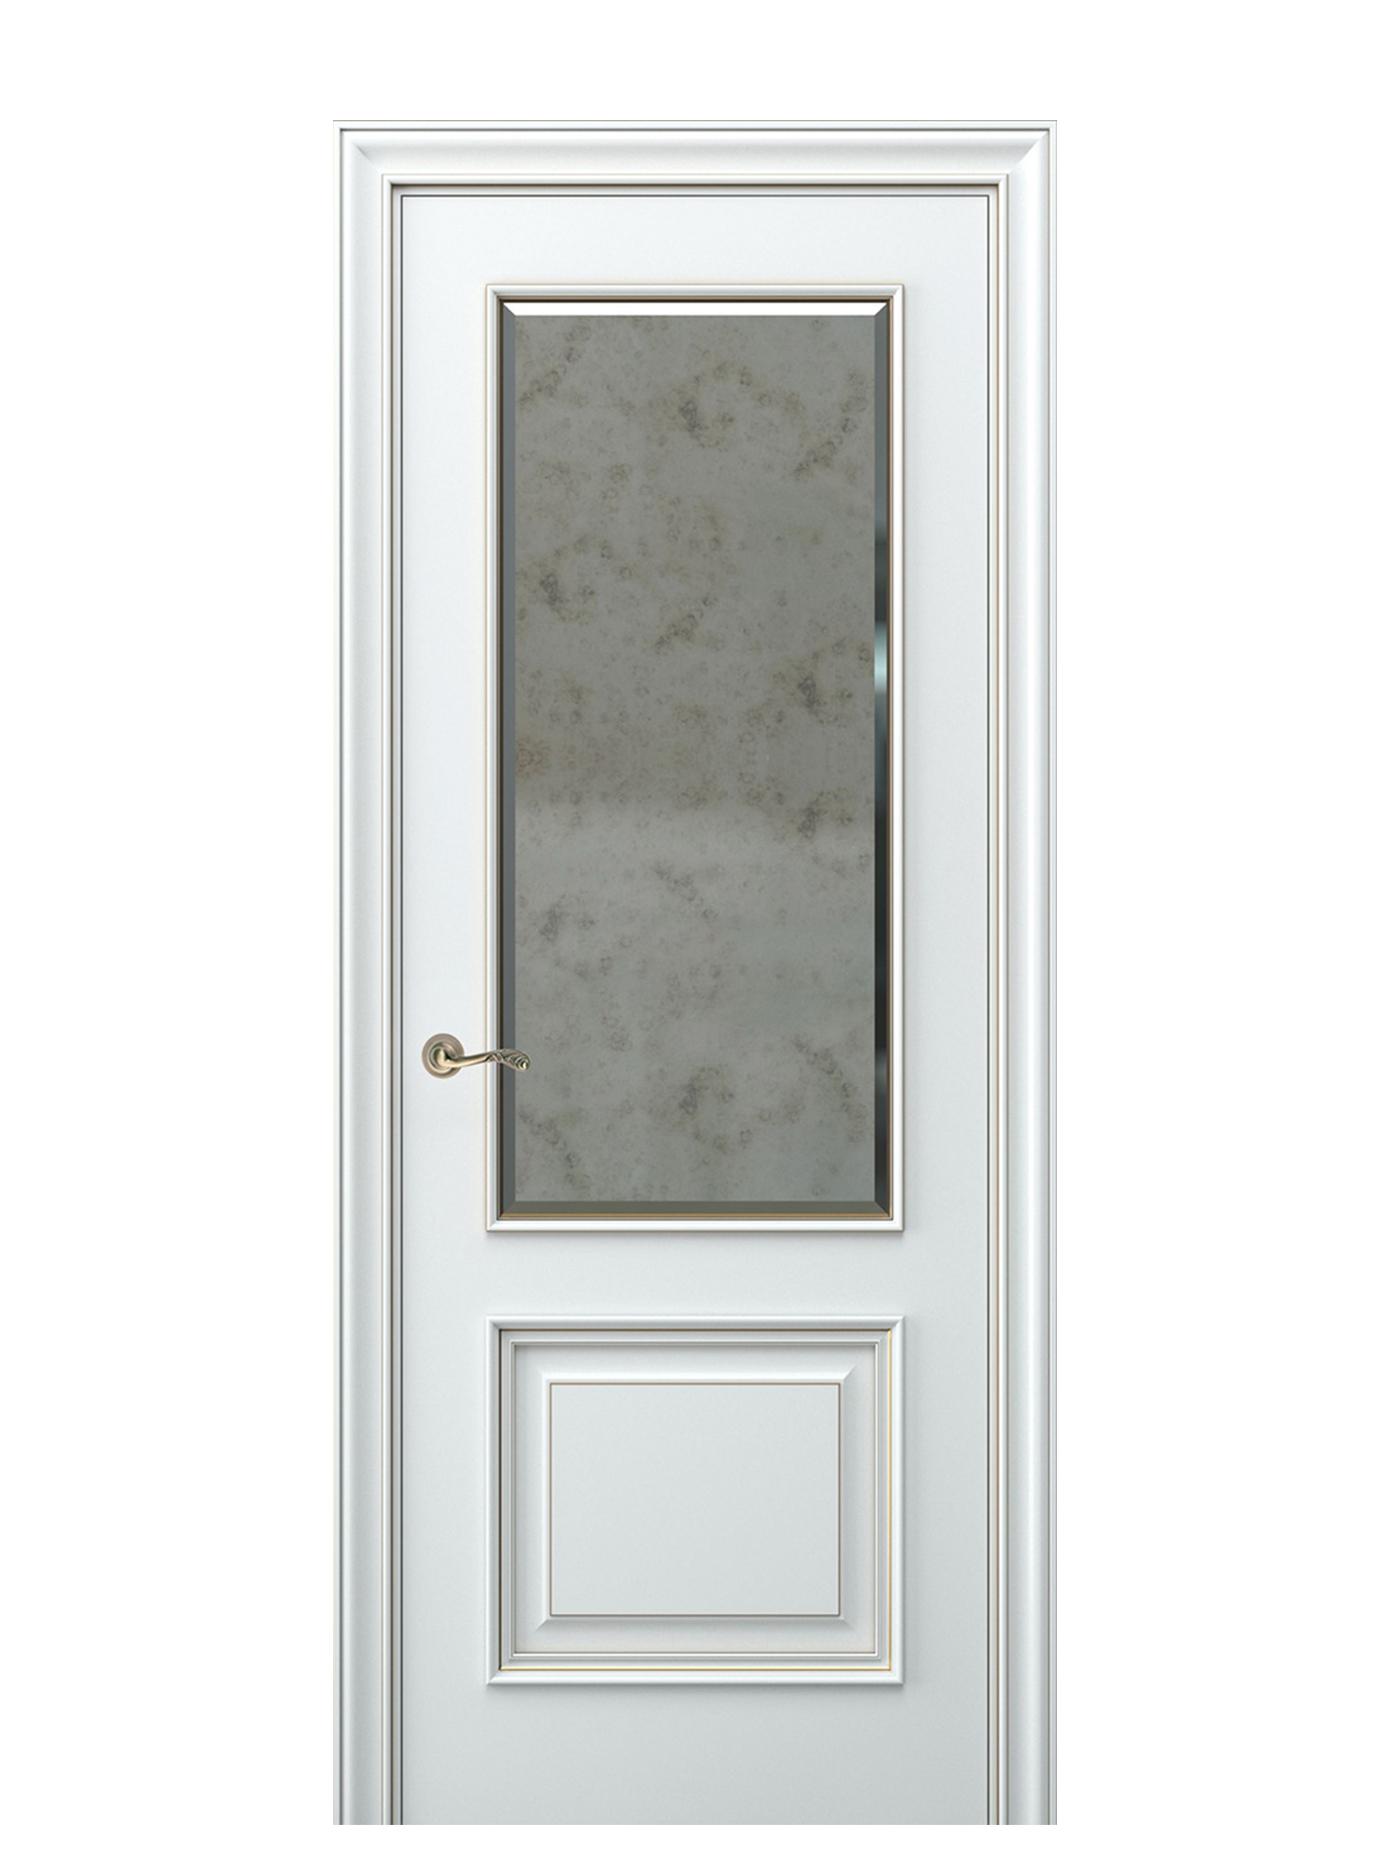 Image Nora Interior Door Italian Enamel White 0